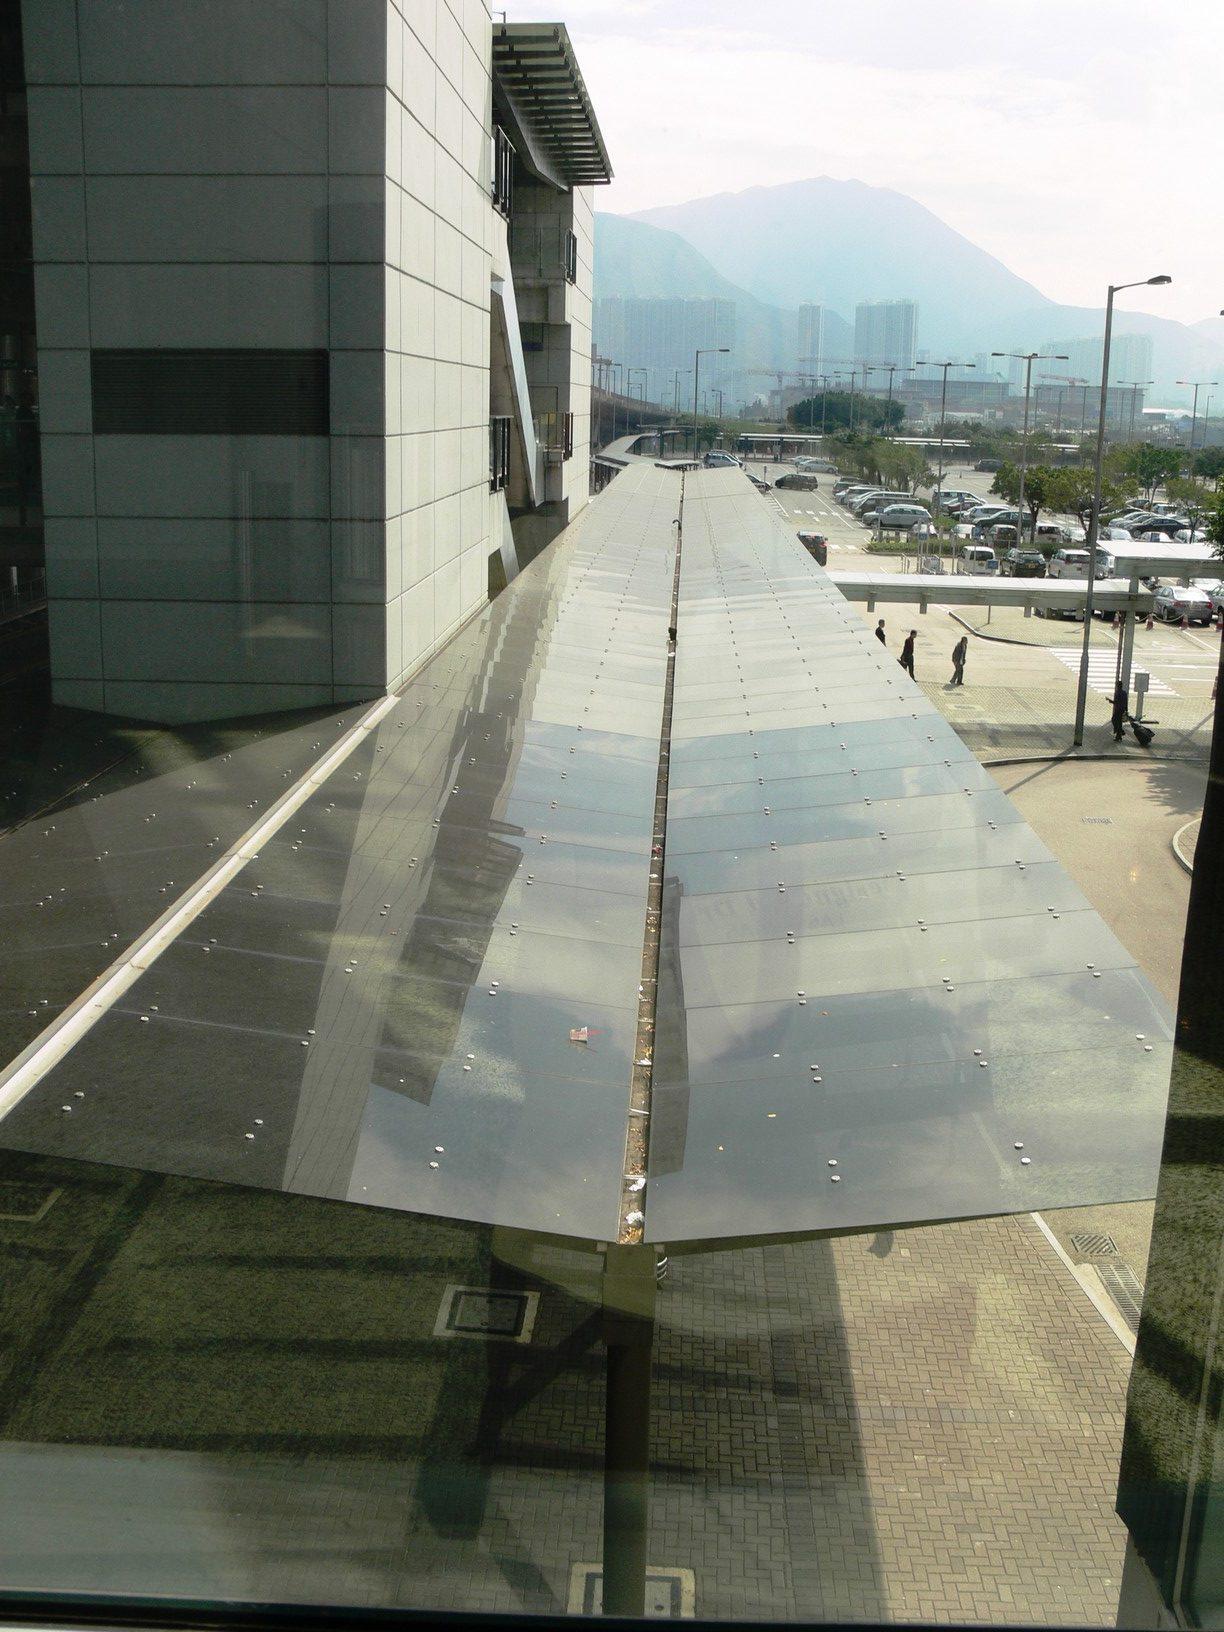 Aluminium Walkway, North Satellite Concourse, Hong Kong International Airport